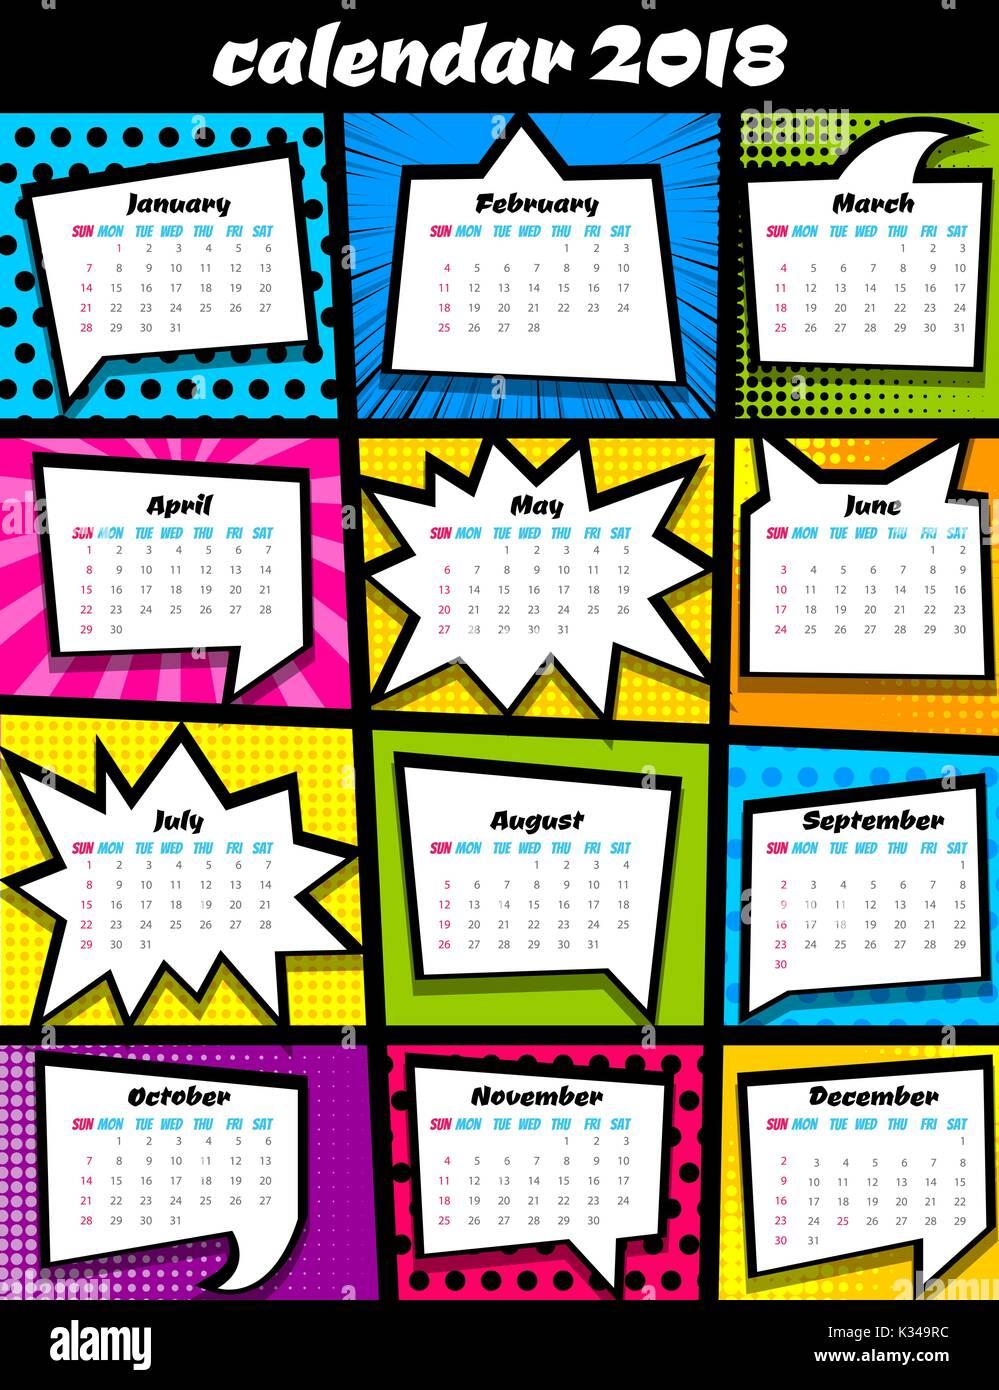 2018 calendar pop art template stock vector art illustration